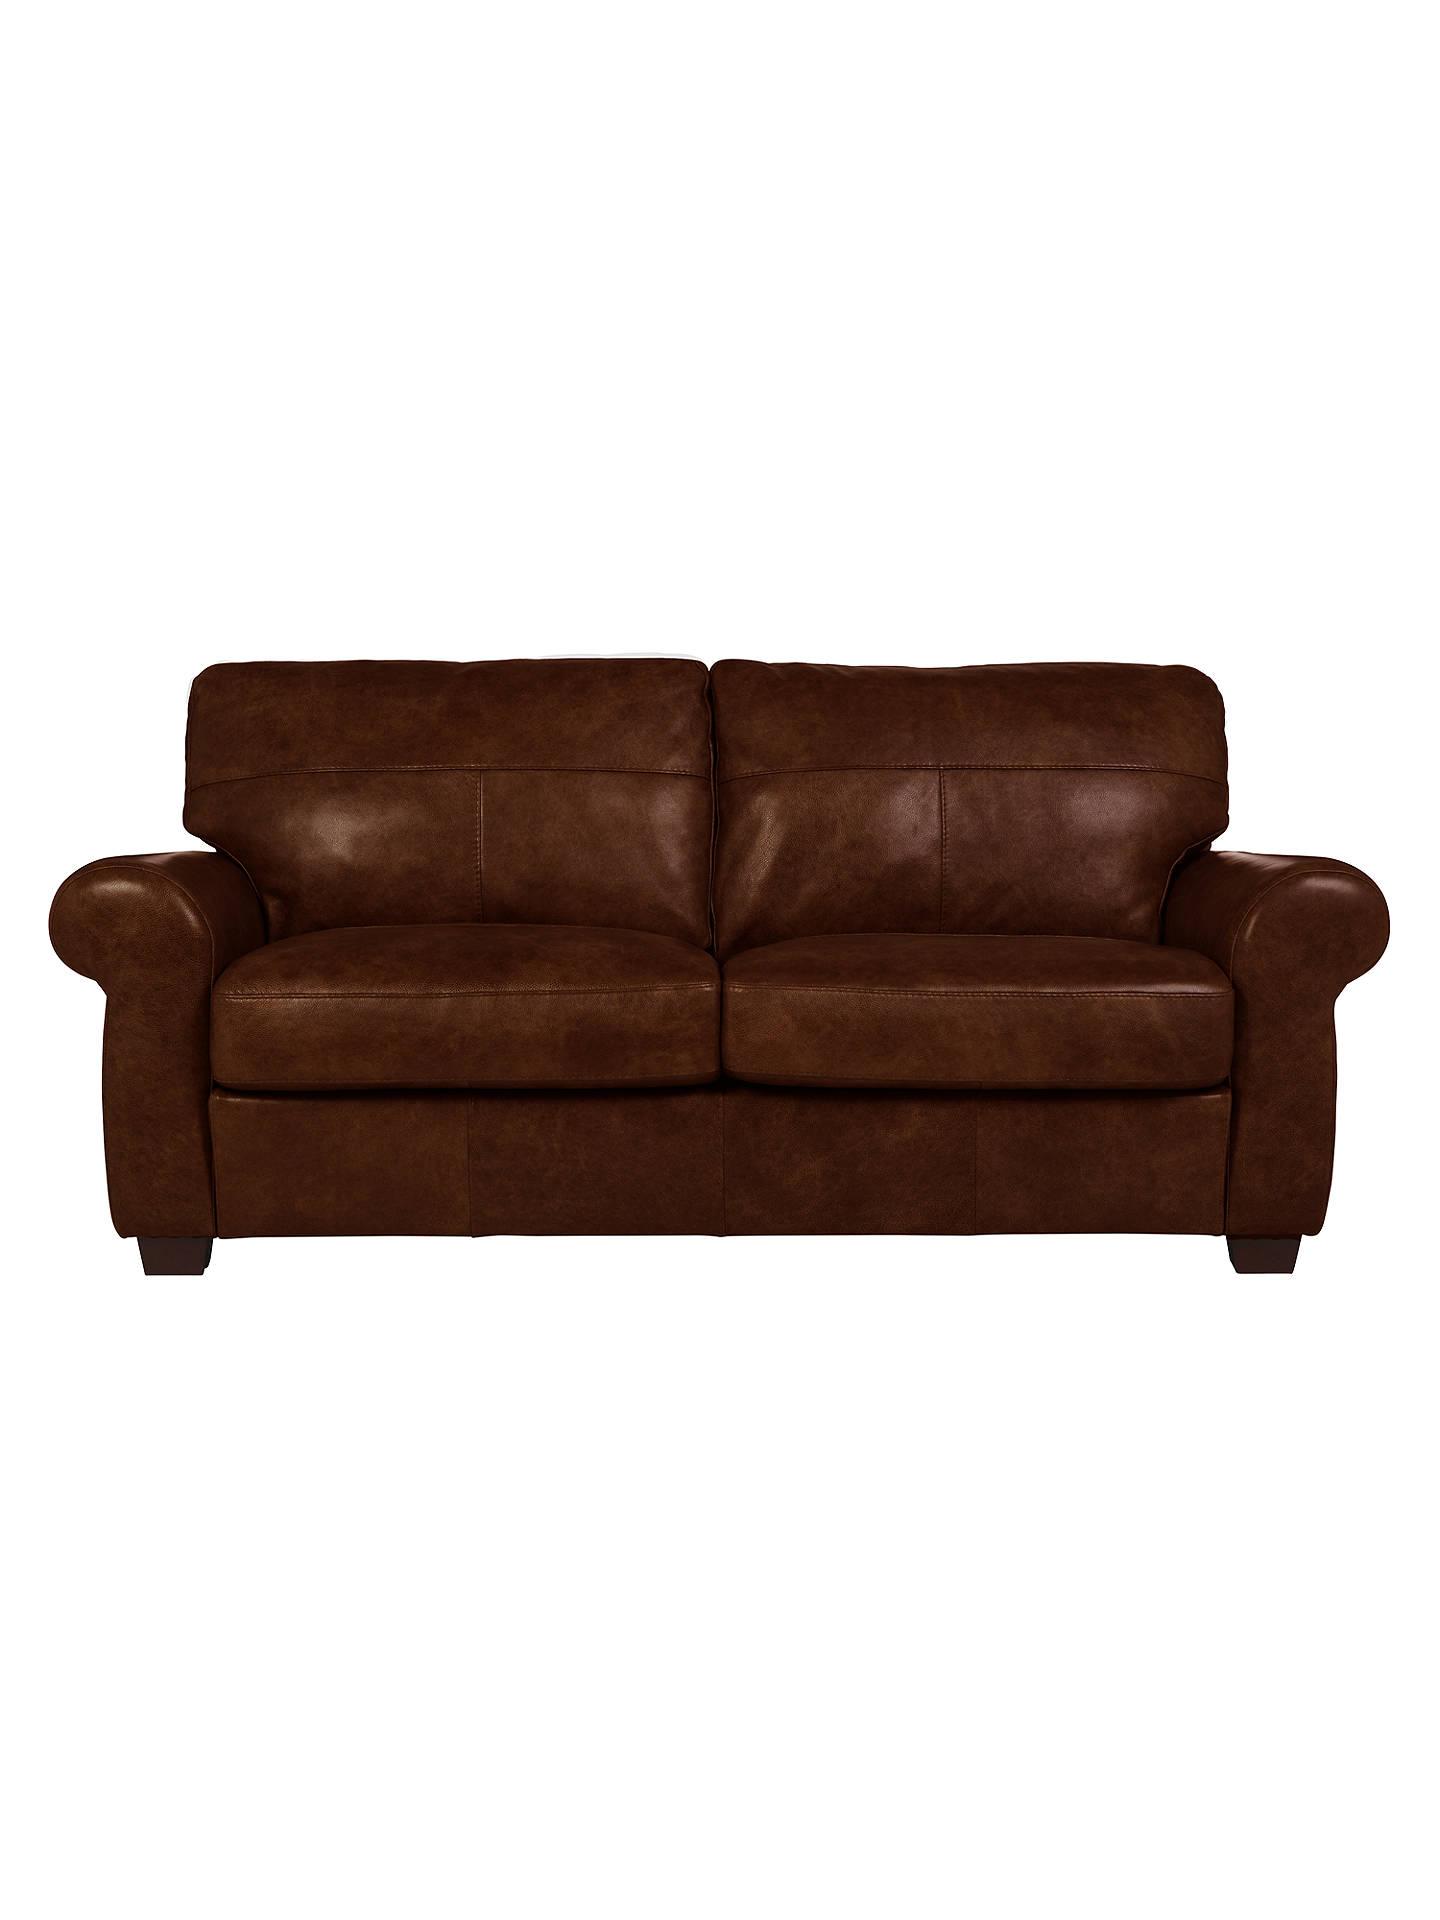 Hampstead Large 3 Seater Leather Sofa